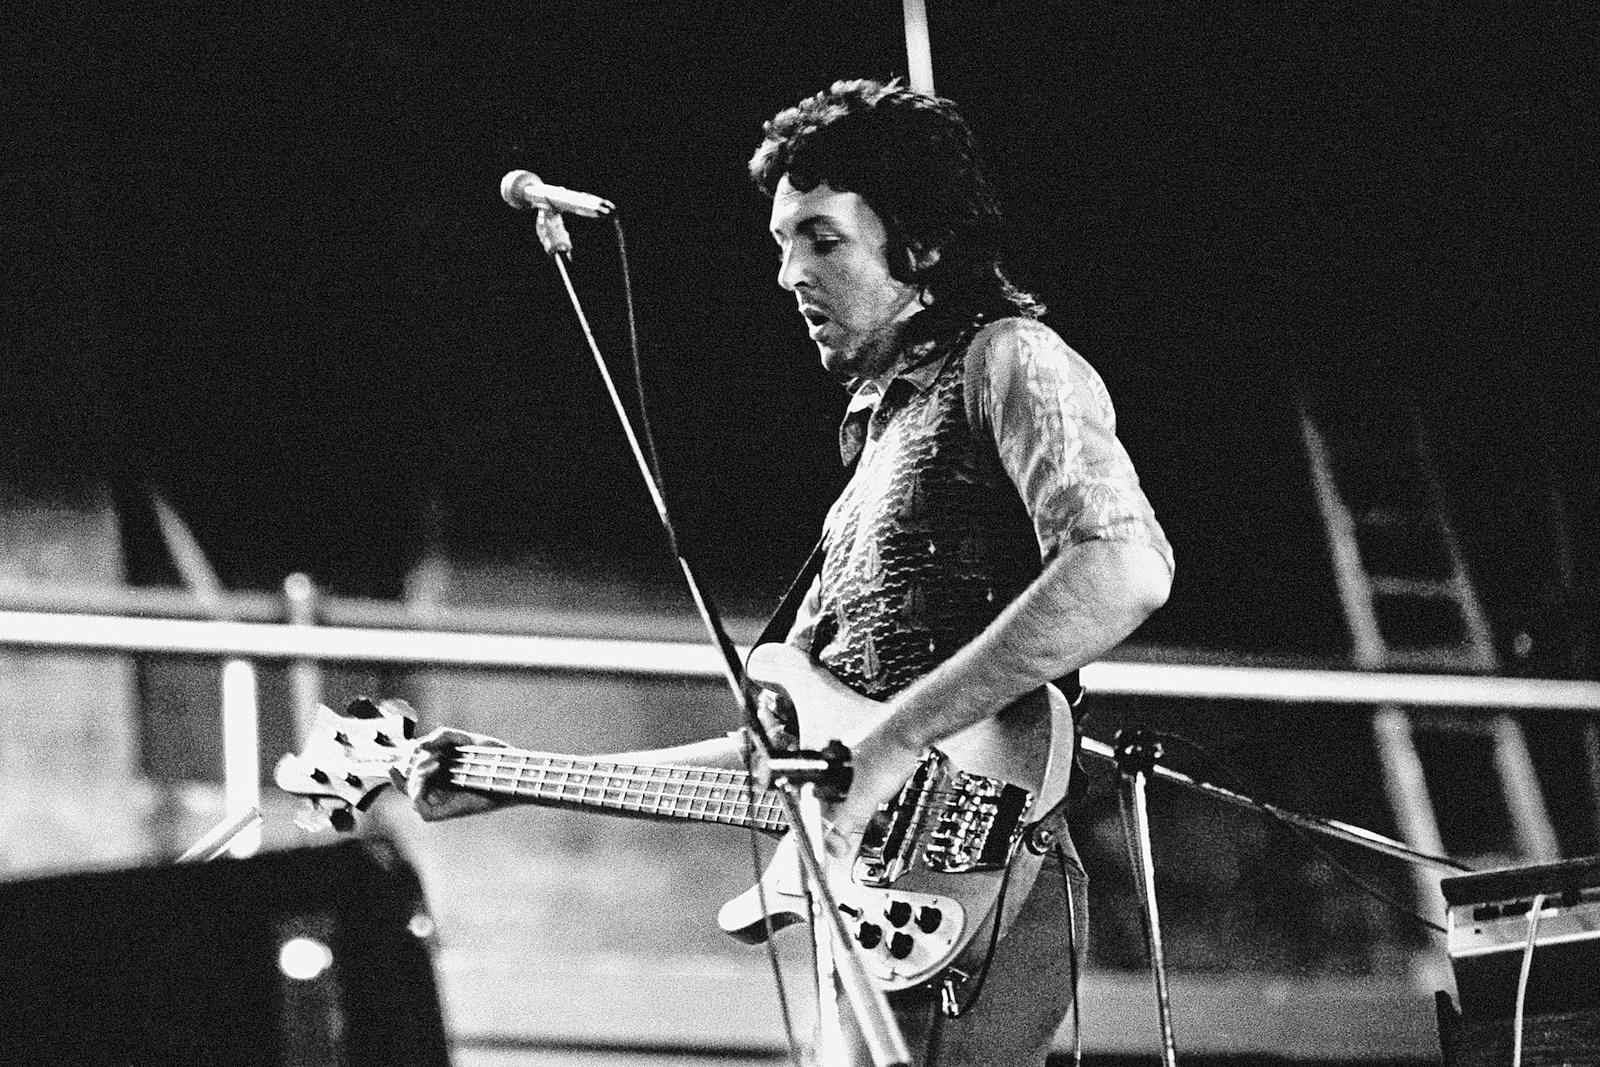 Top 10 Underrated Paul McCartney Songs